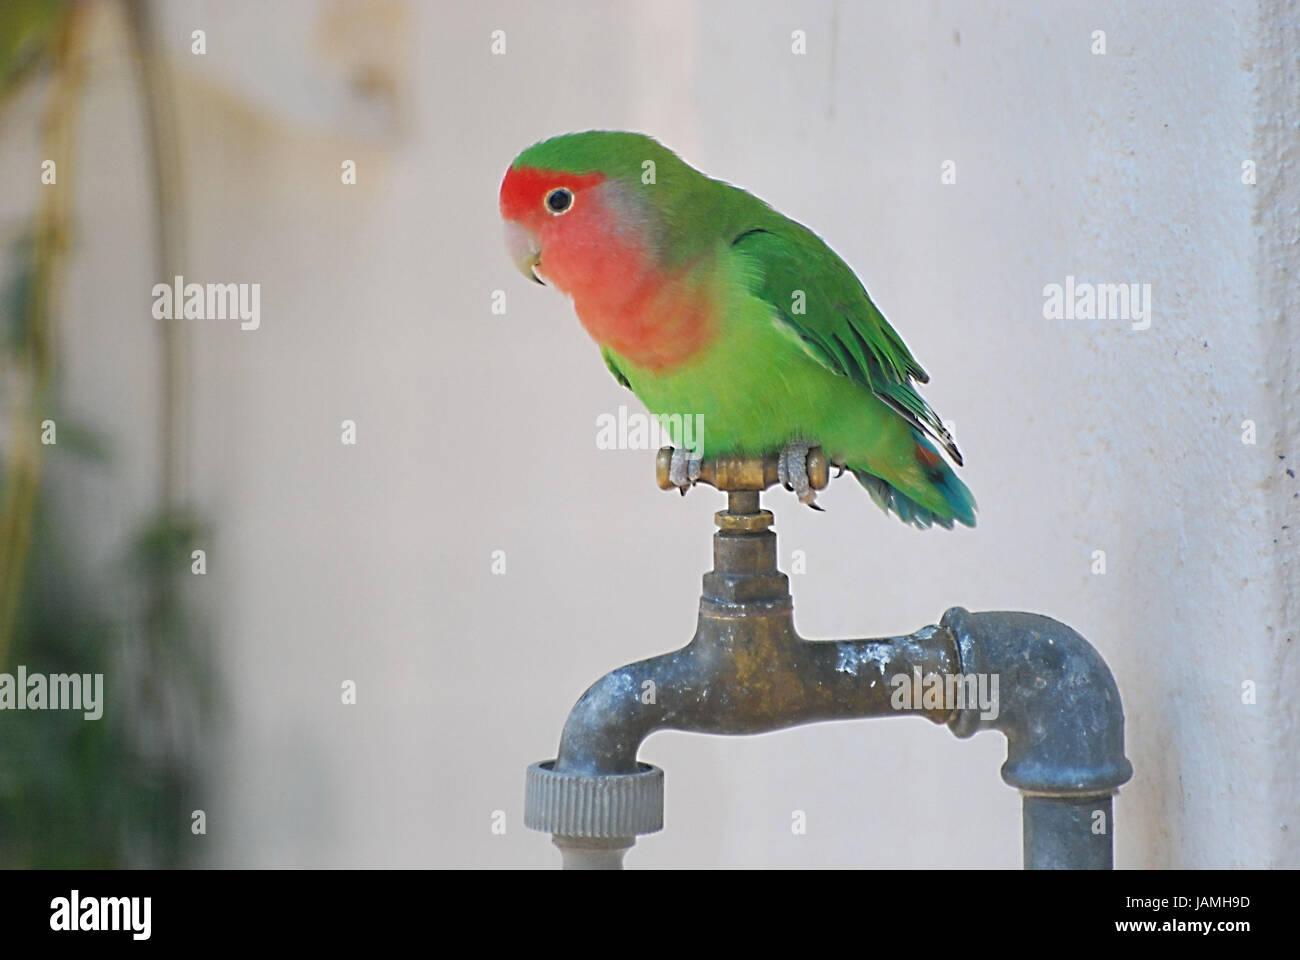 Parrot,rose brains,tap, - Stock Image